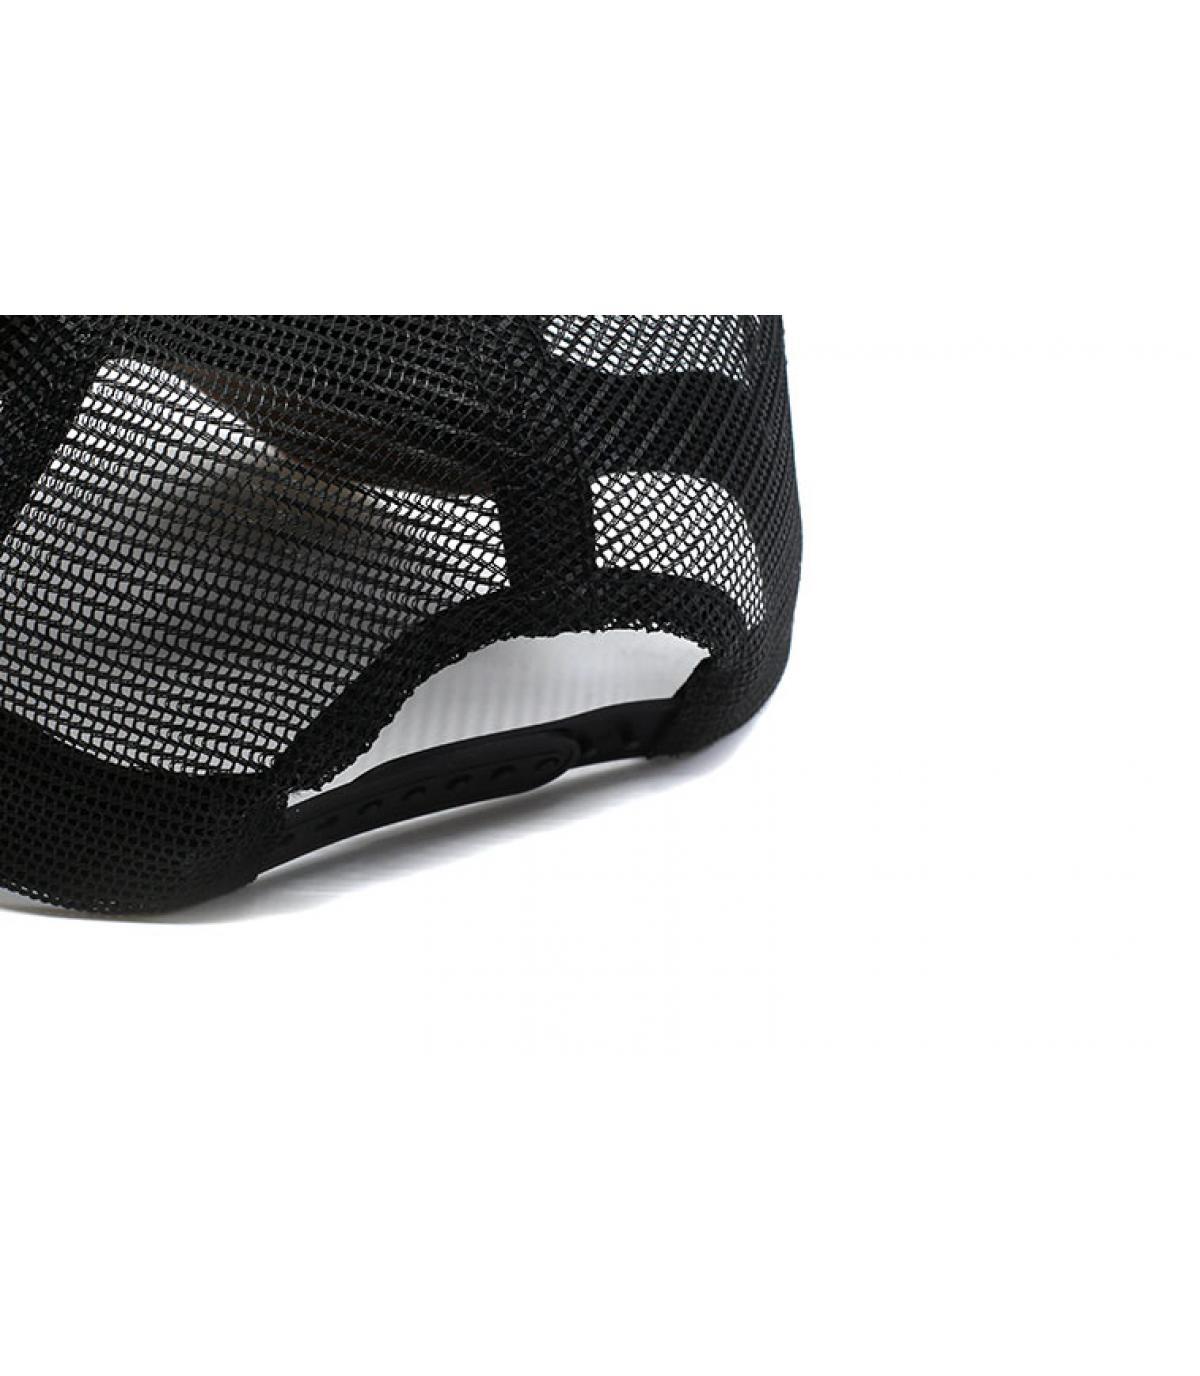 Dettagli Trucker Eye Patch black brown - image 5